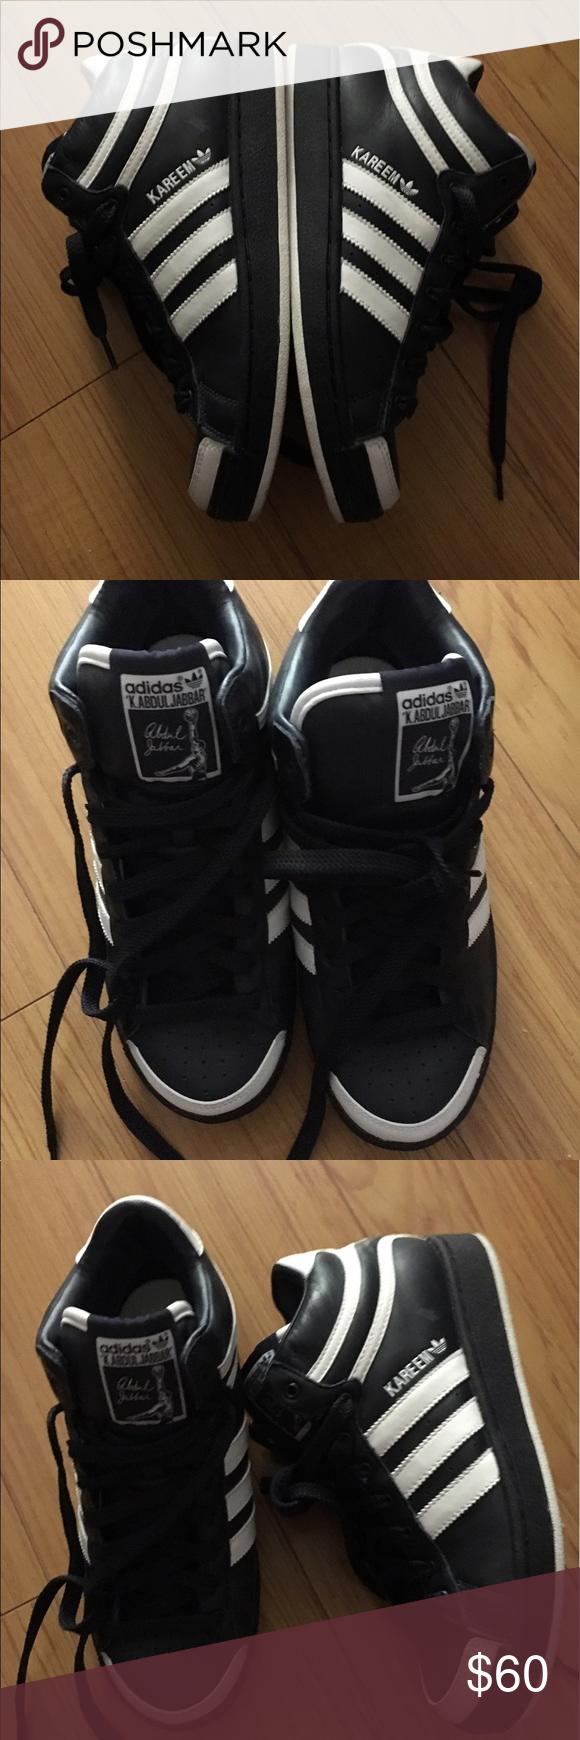 adidas uomini kareem abdul. scarpe da ginnastica pinterest adidas